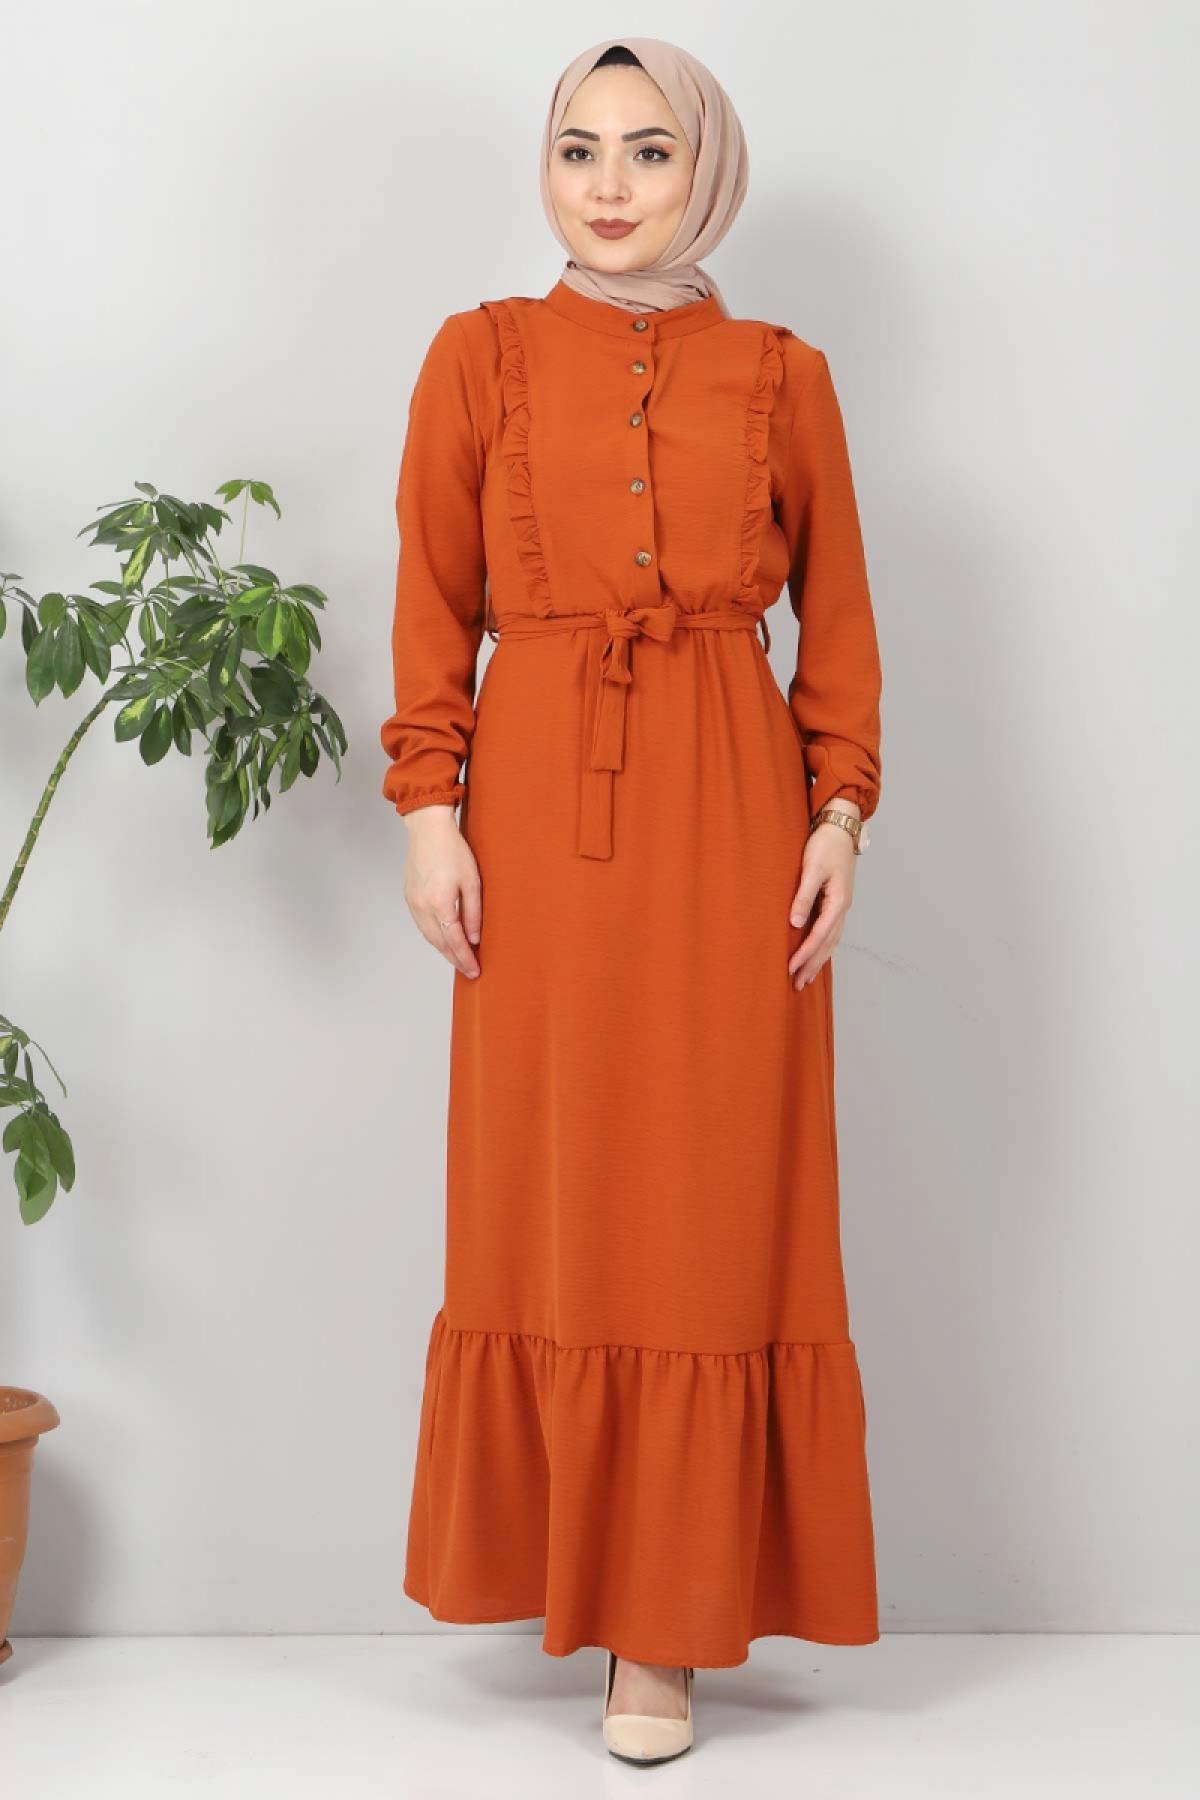 Önü Fırfırlı Ayrobin Elbise TSD11011 Turuncu